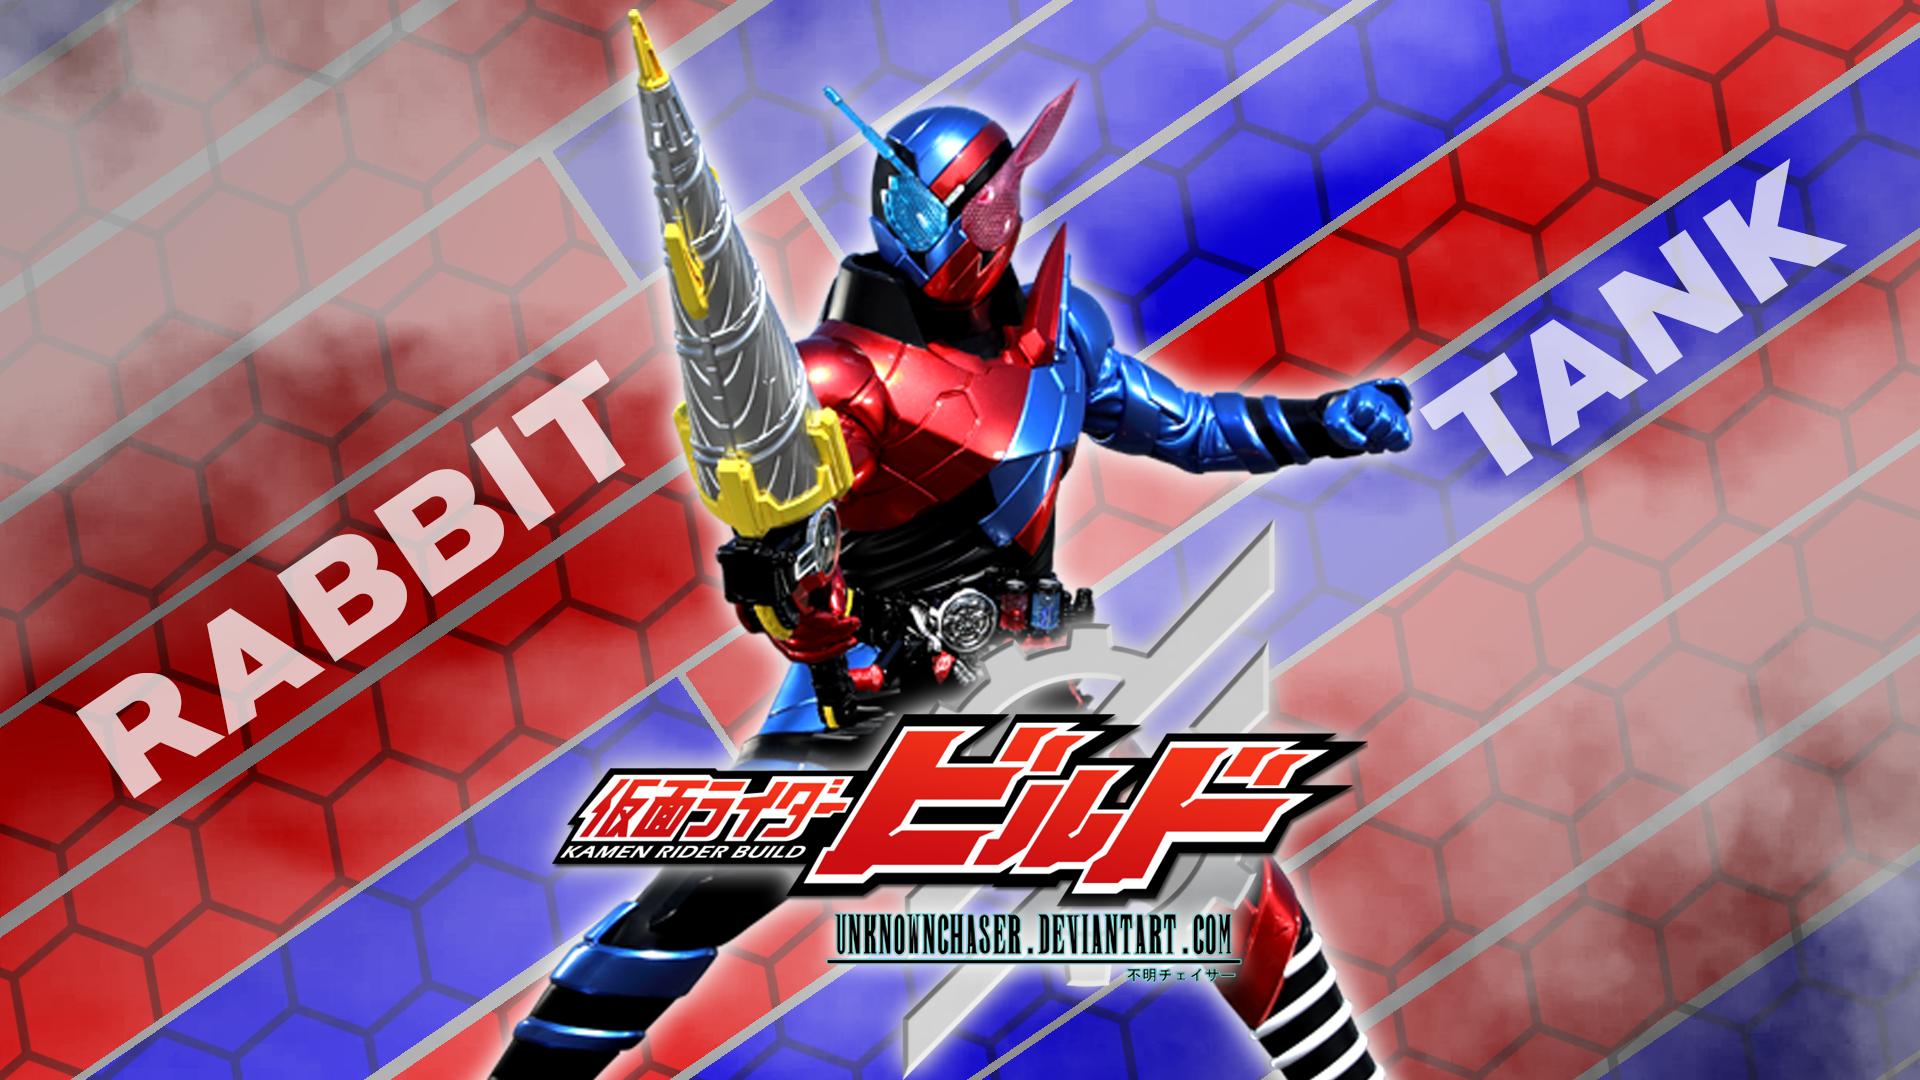 Kamen Rider Build Rabbittank Wallpaper By Unknownchaser On